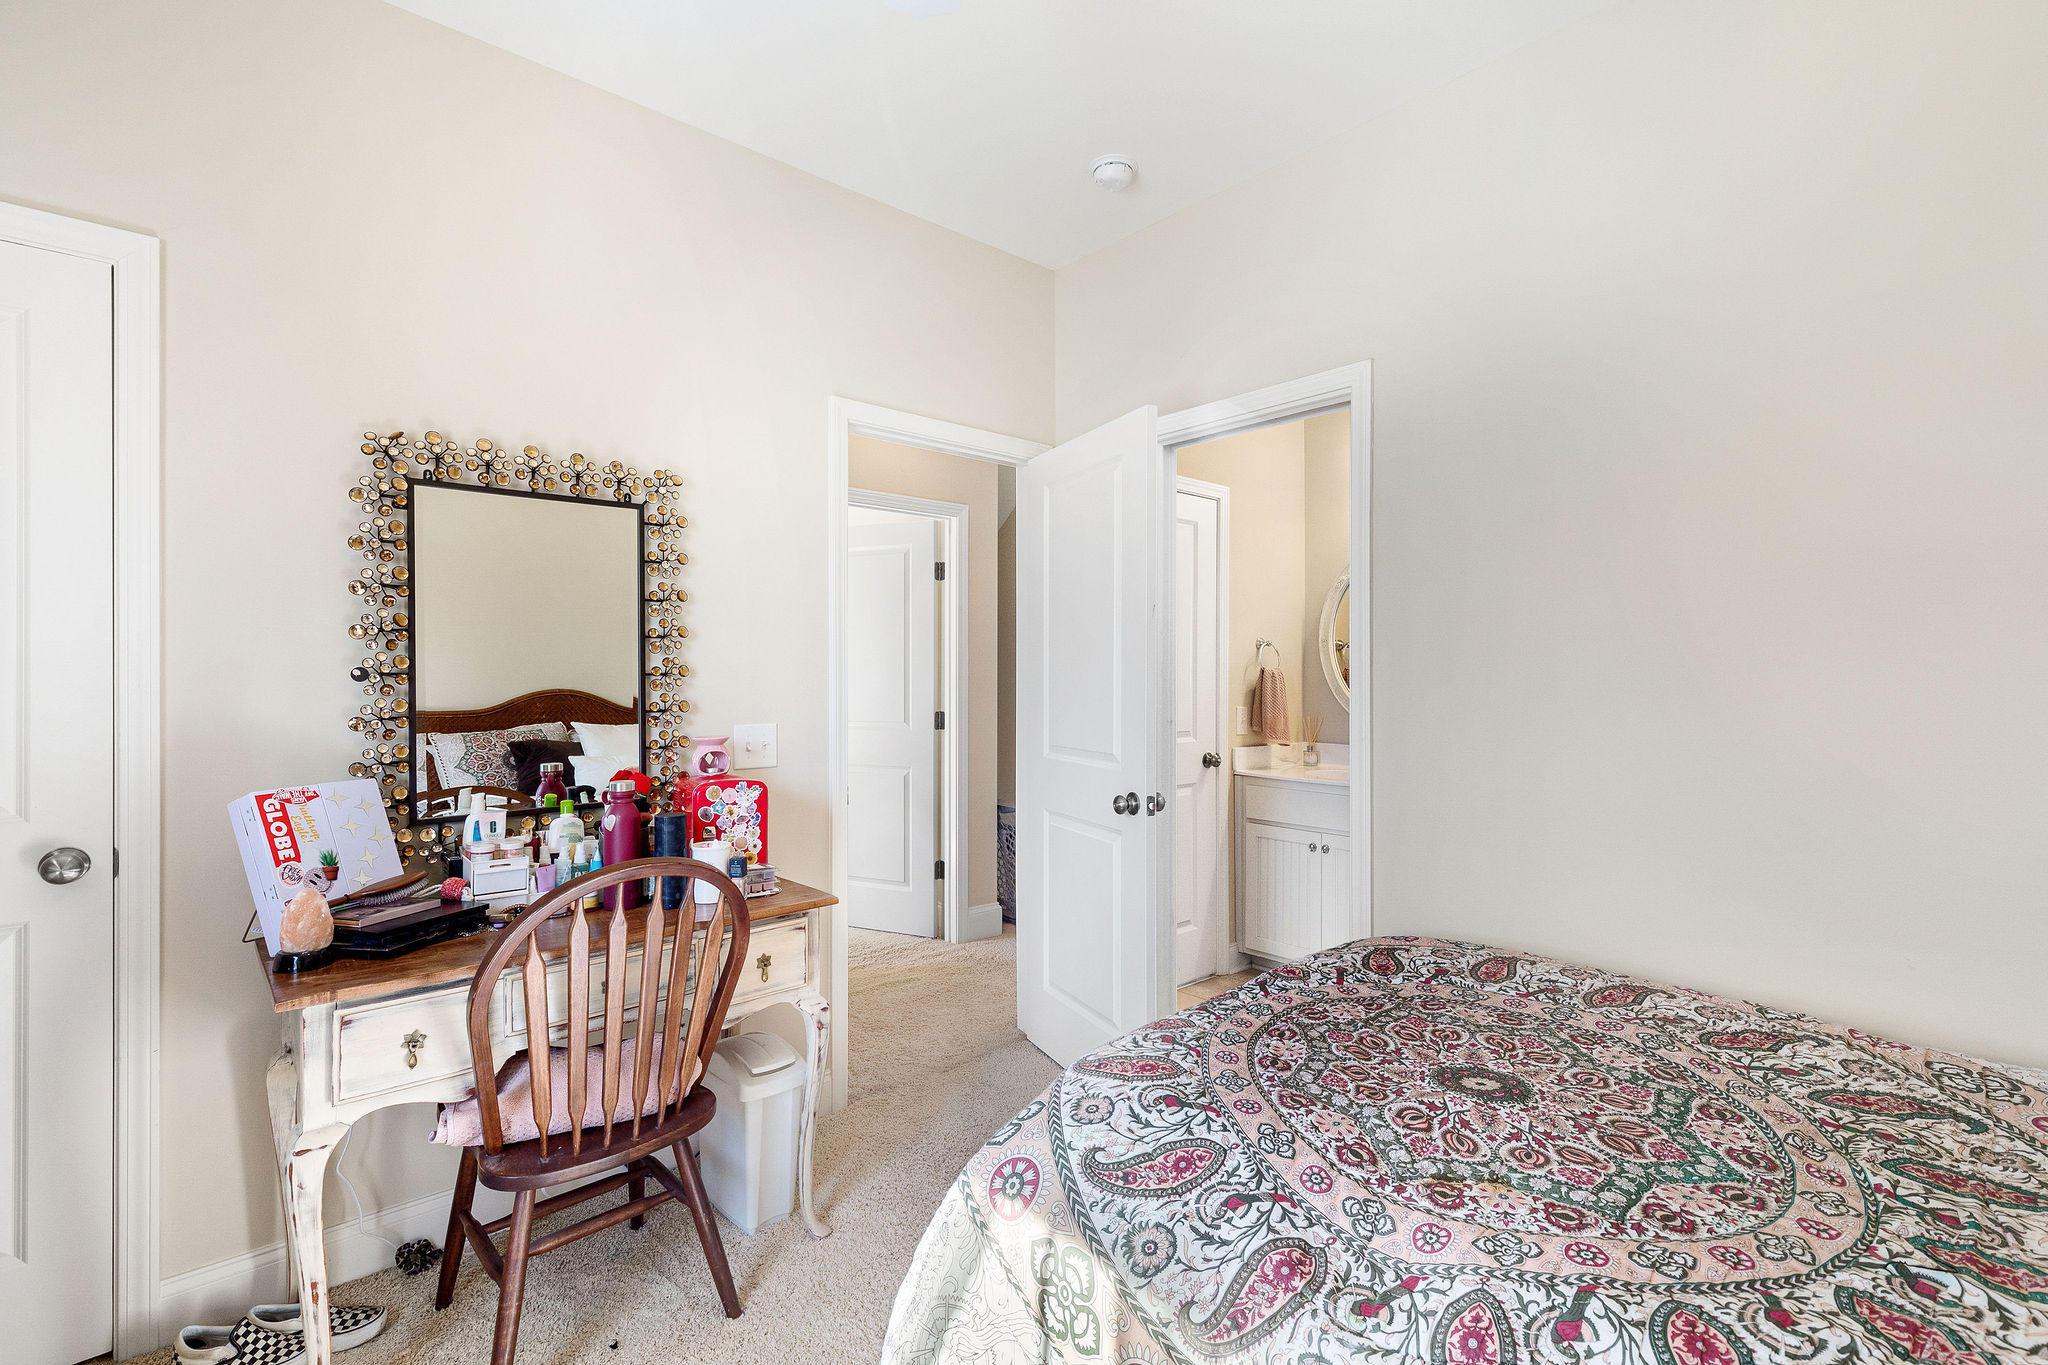 Dunes West Homes For Sale - 3212 Hatchway, Mount Pleasant, SC - 55